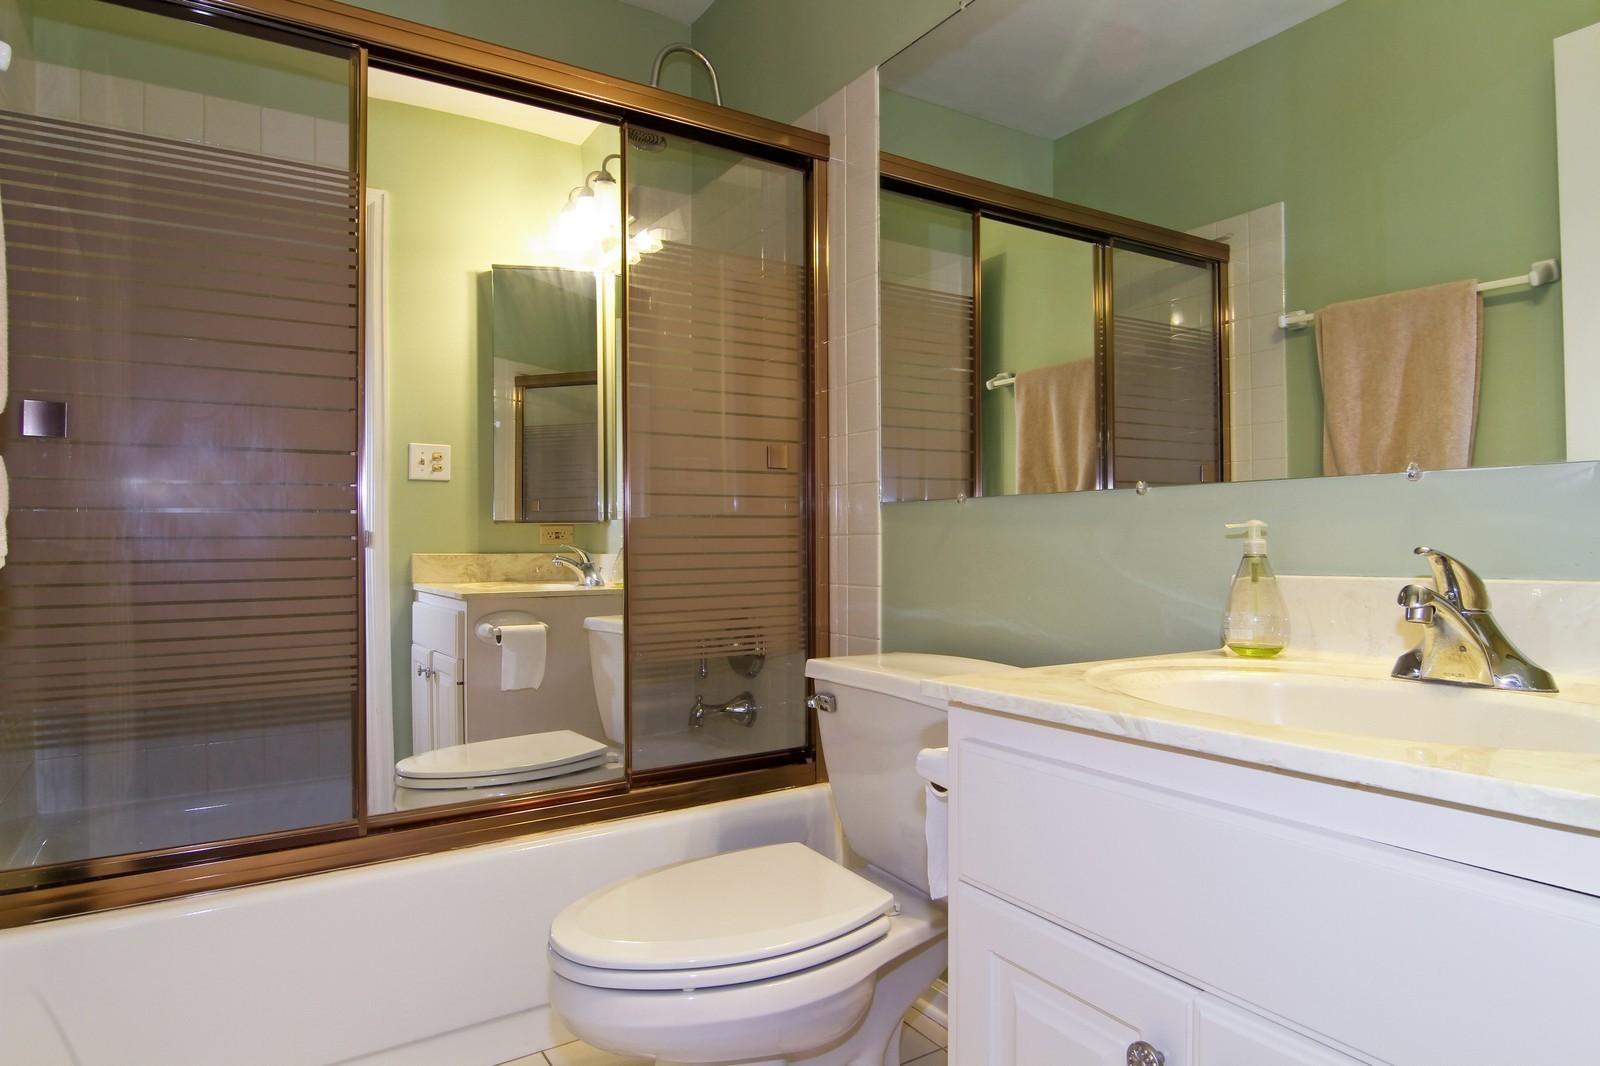 Real Estate Photography - 23 Glencoe Ct, Unit 202-B, Naperville, IL, 60565 - 2nd Bathroom